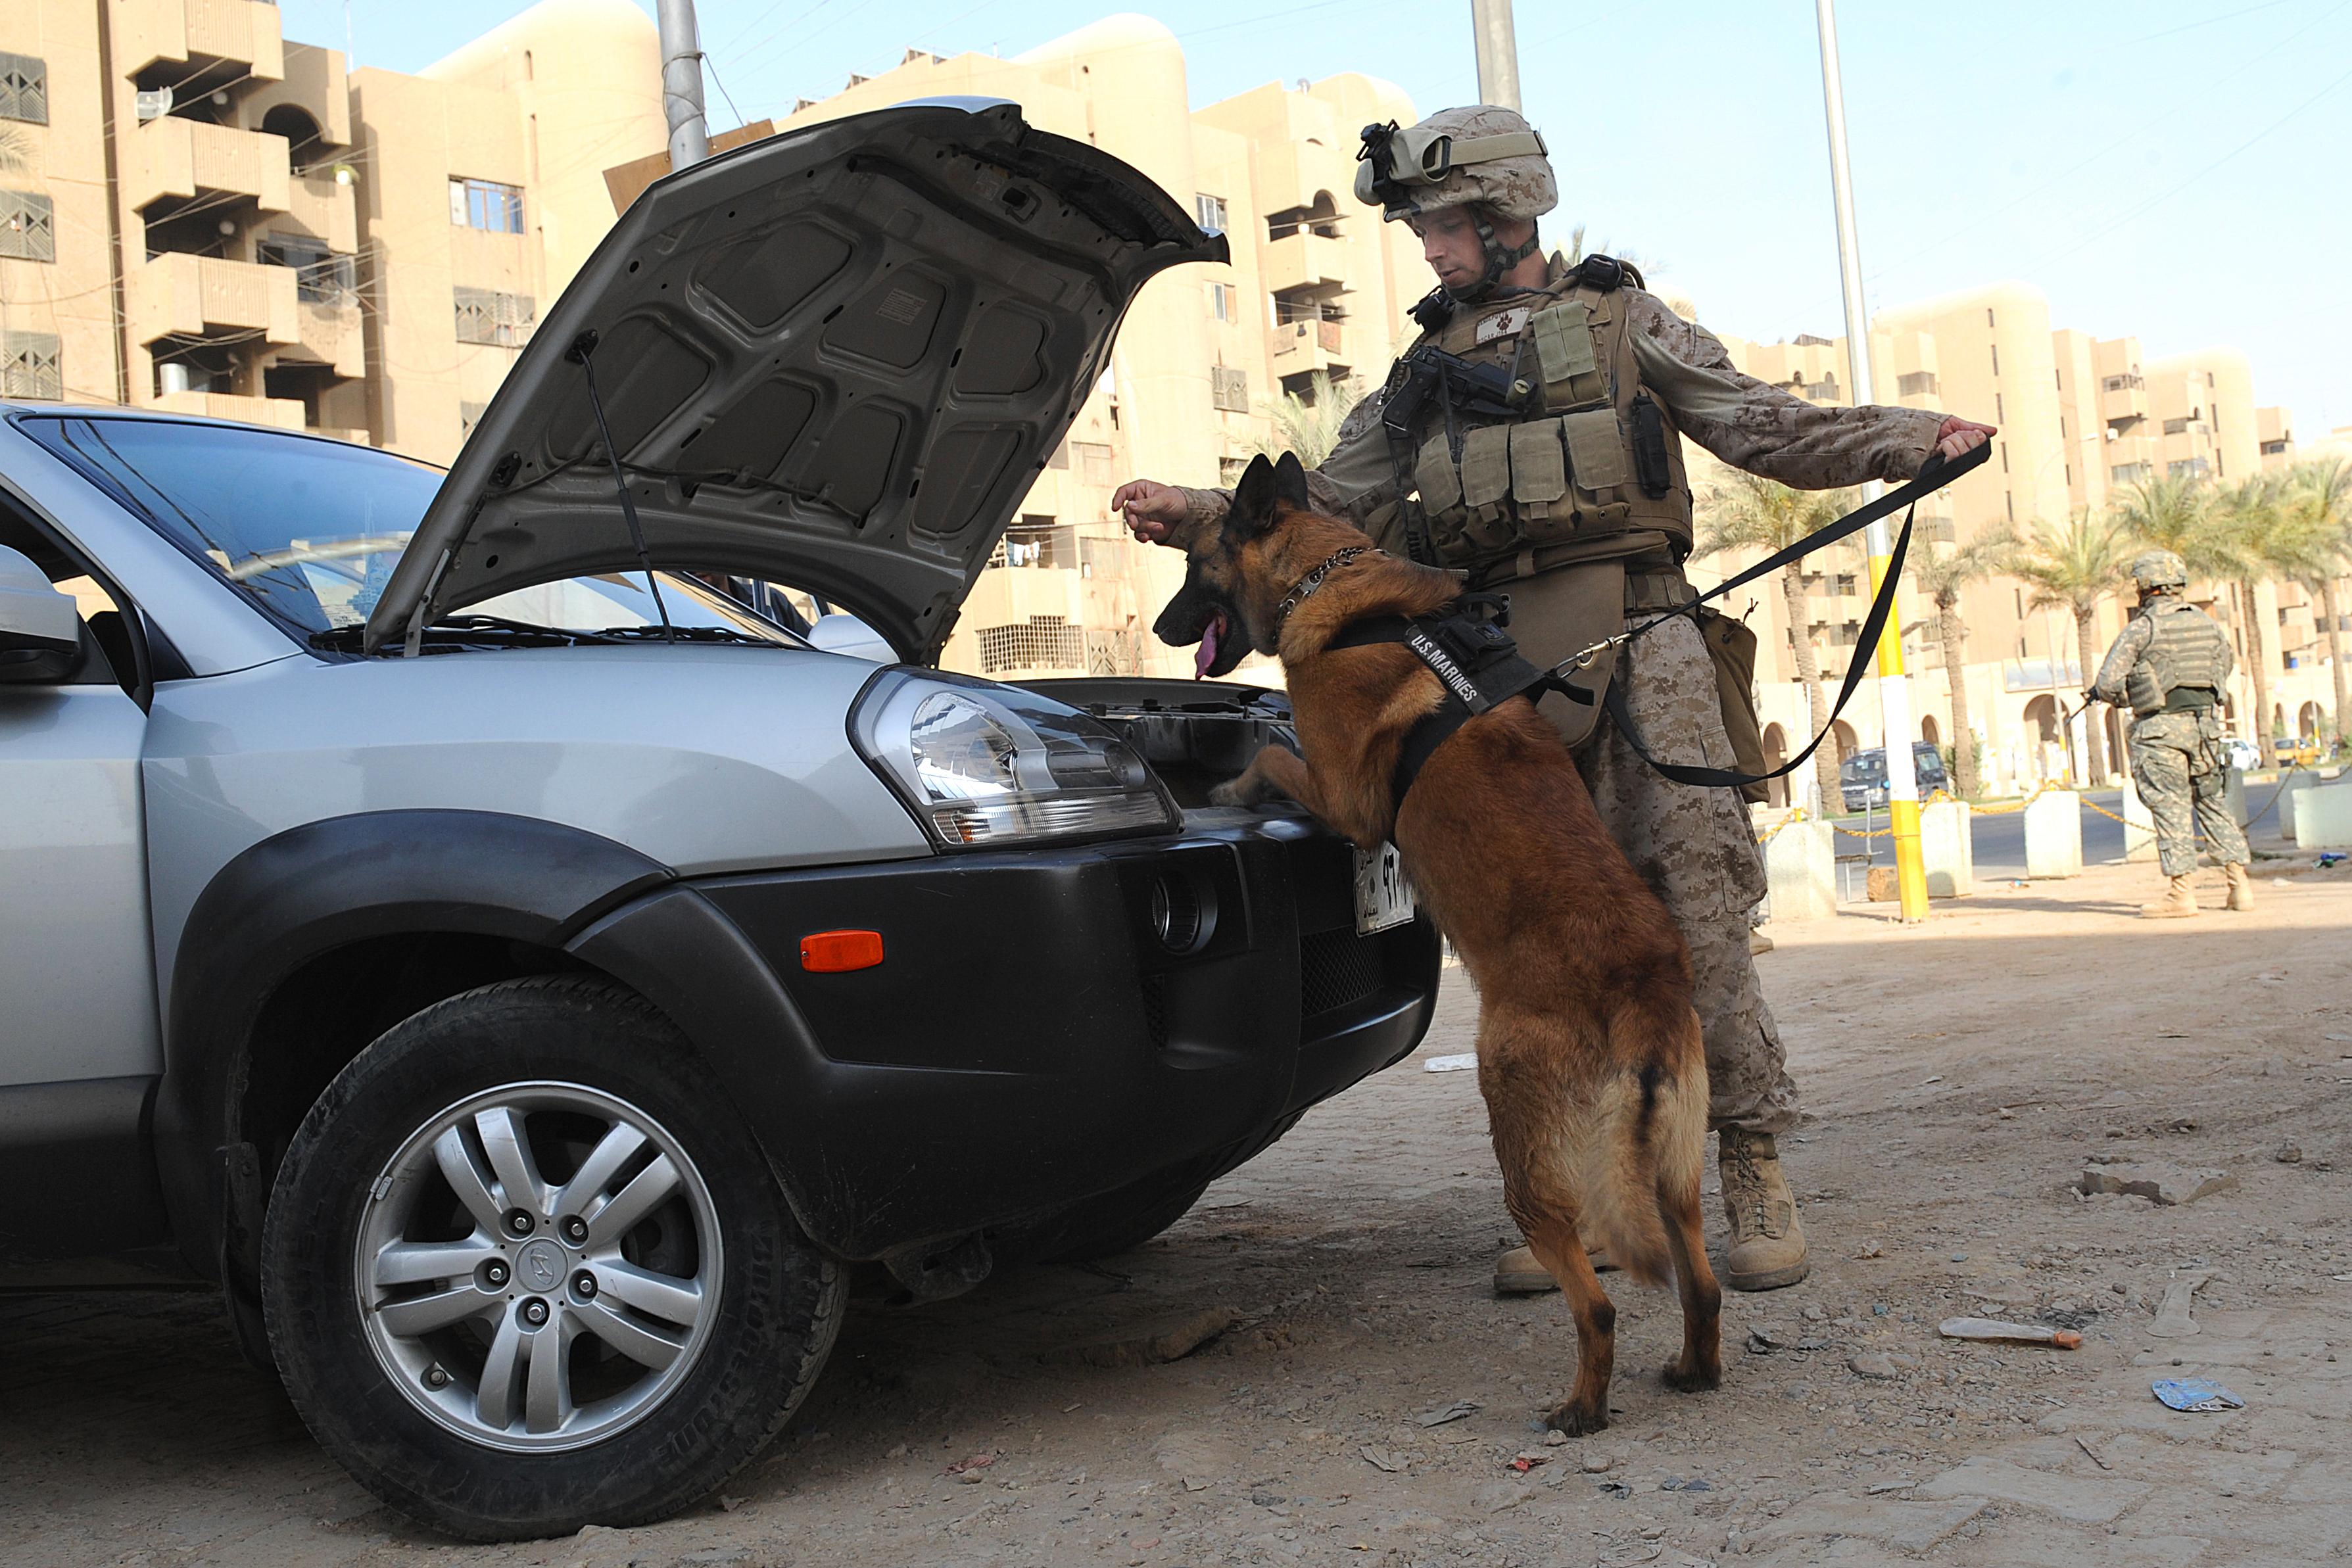 File:Defense.gov Photo Essay 090625-A-6401B-097.jpg